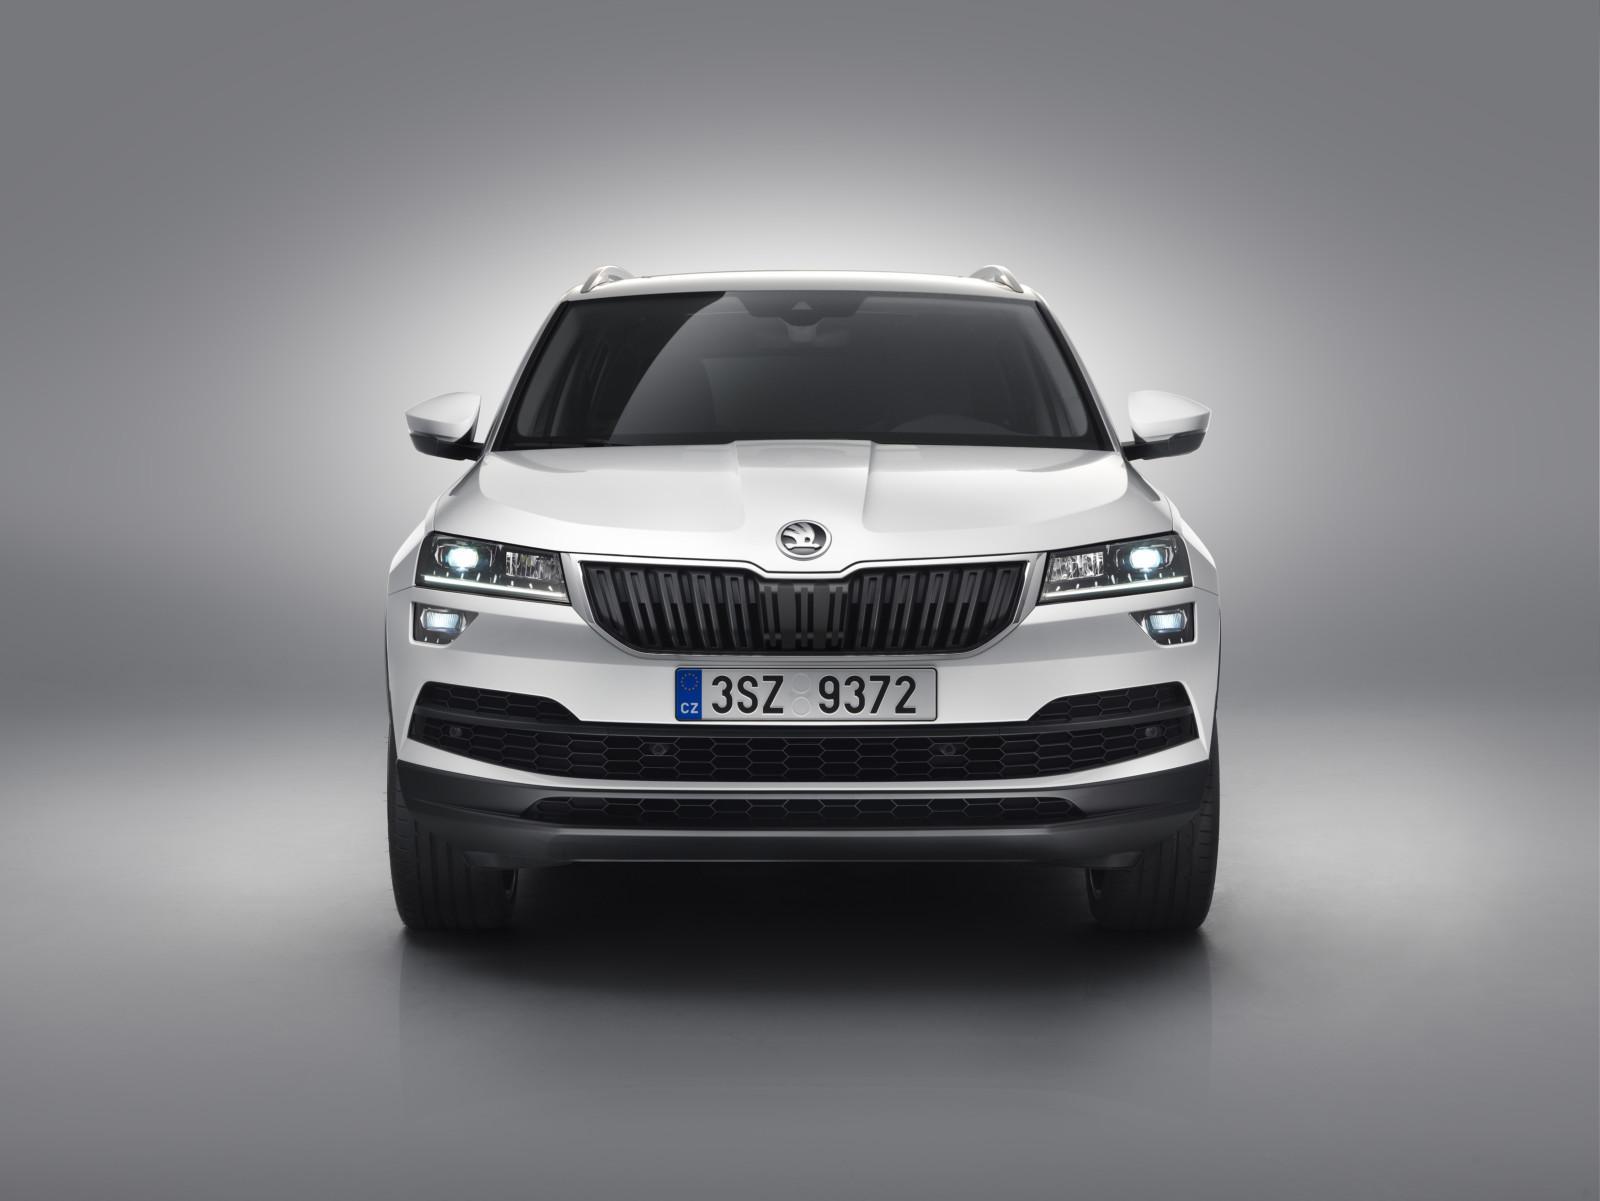 Ka 00019 - Skoda dévoile son nouveau SUV, le Karoq